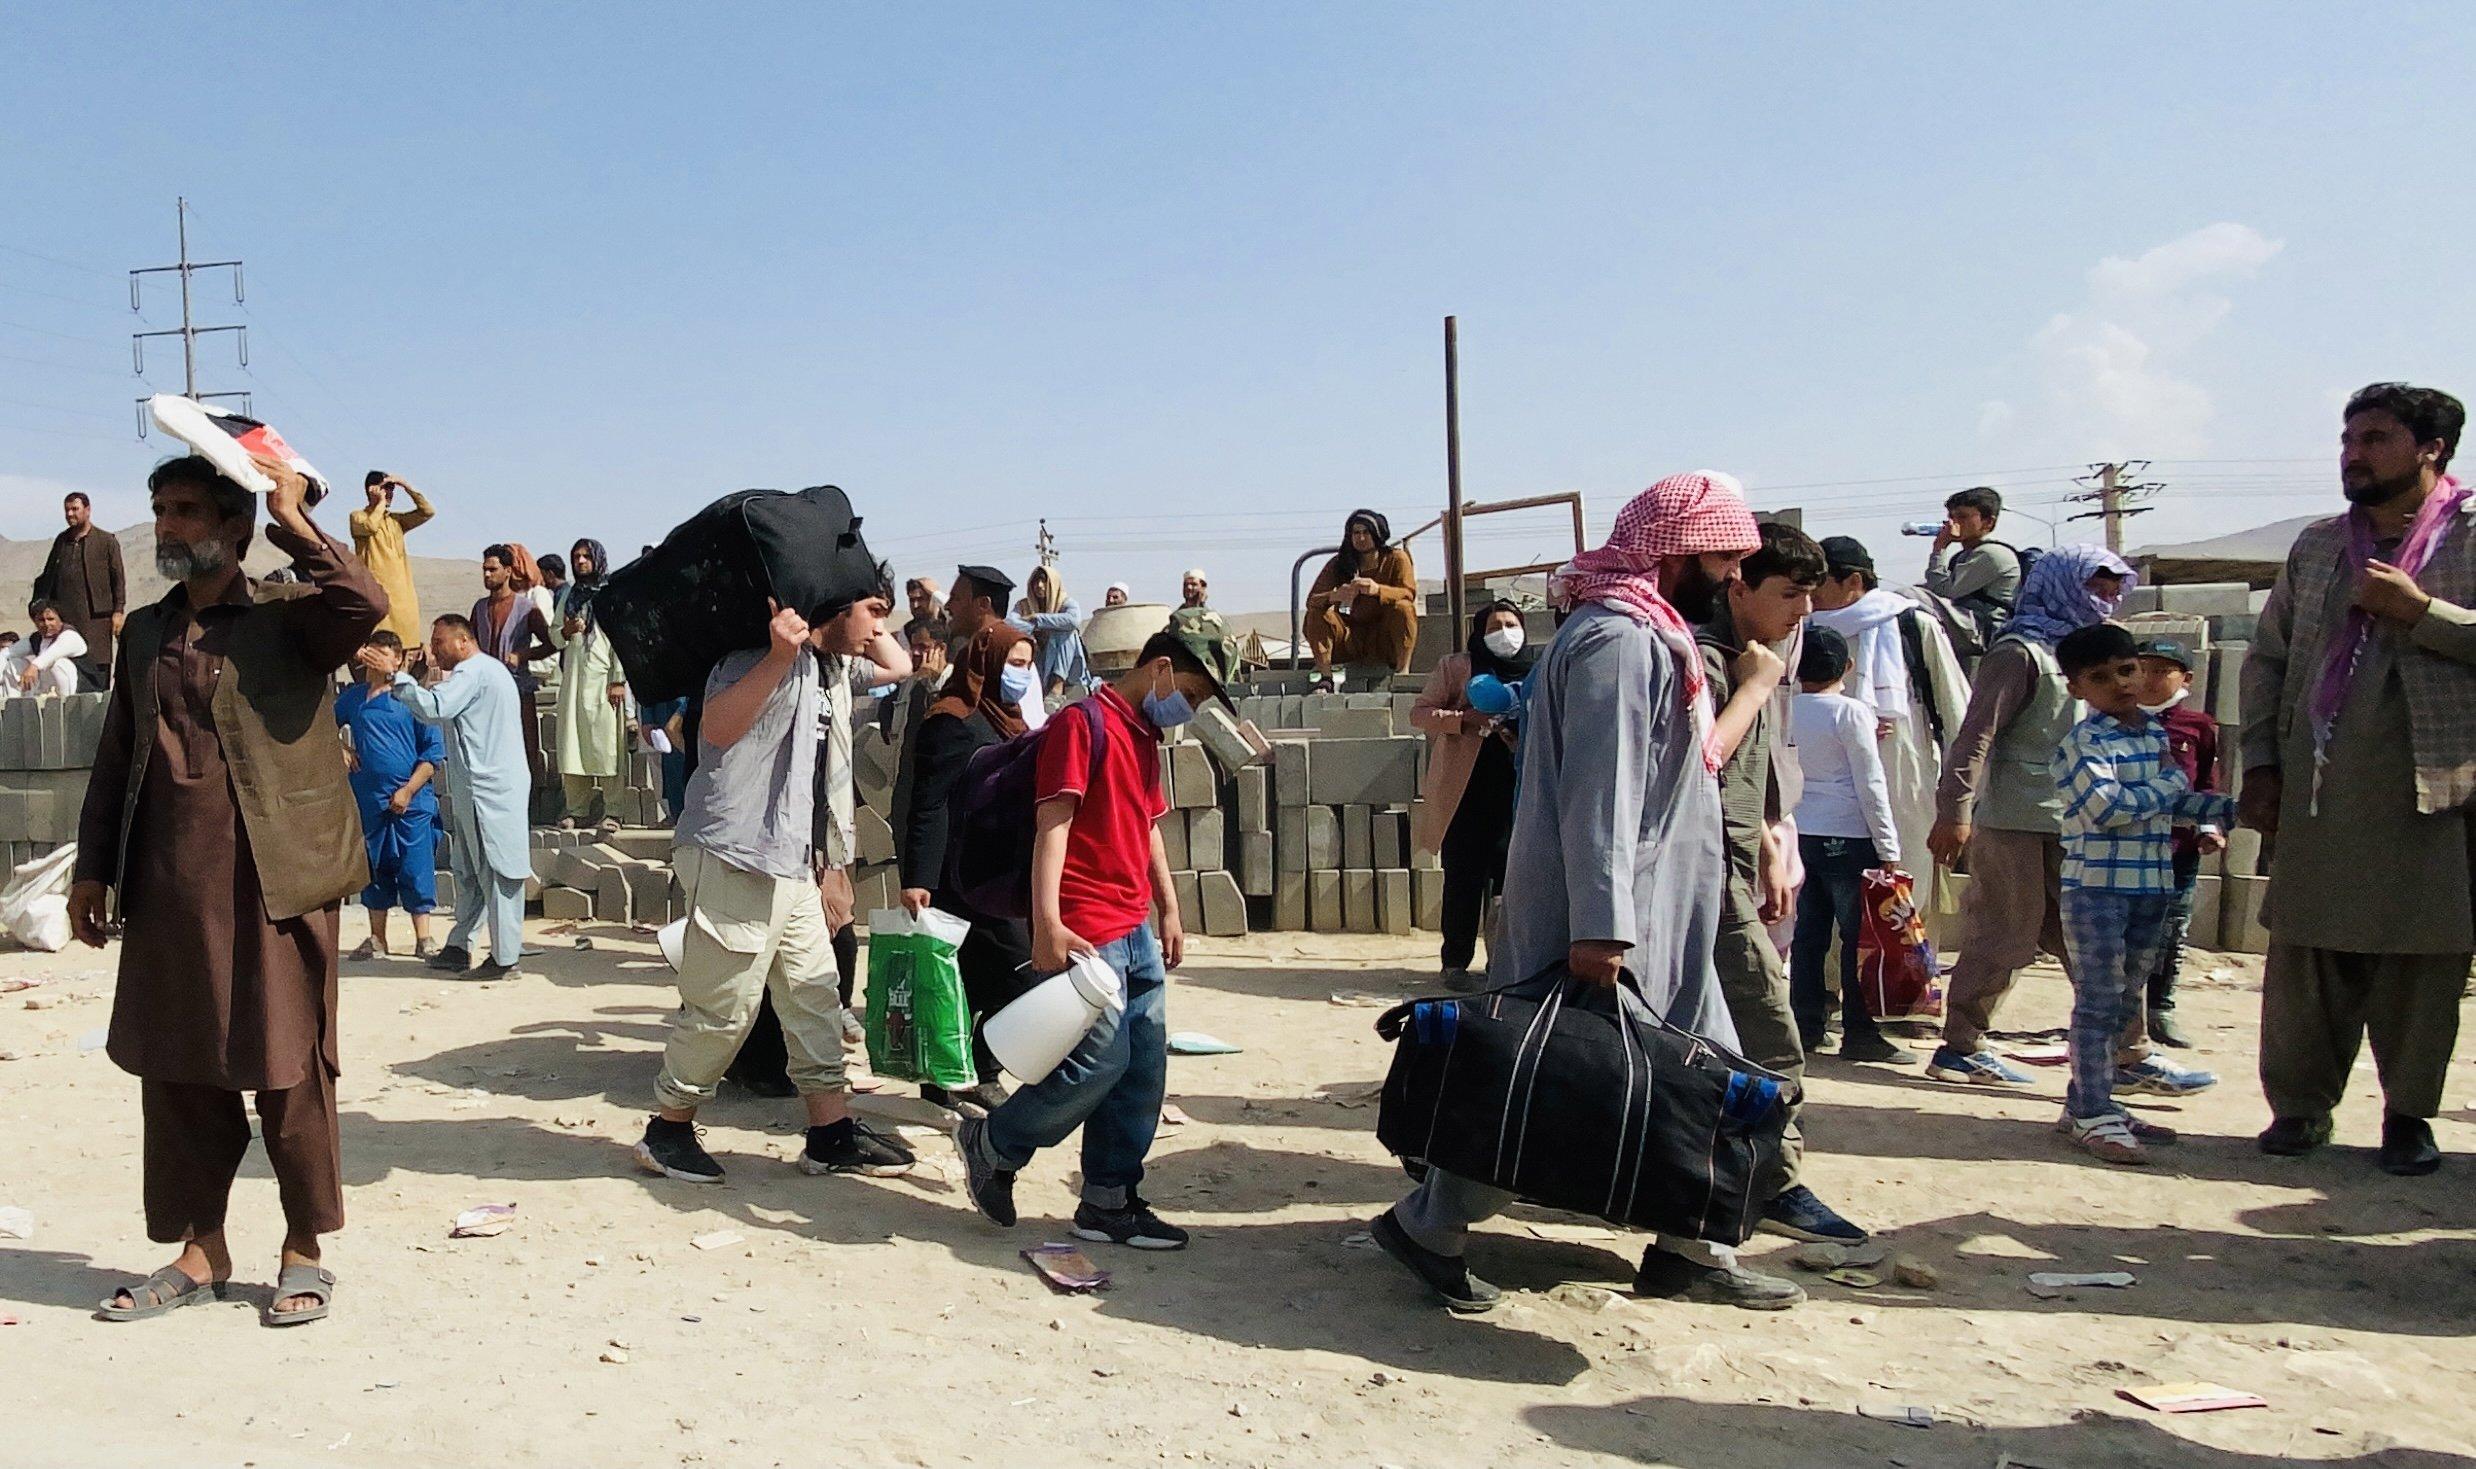 Afghans gather outside the Kabul Hamid Karzai International Airport to flee the country, Kabul, Afghanistan, Aug. 19, 2021. (EPA Photo)